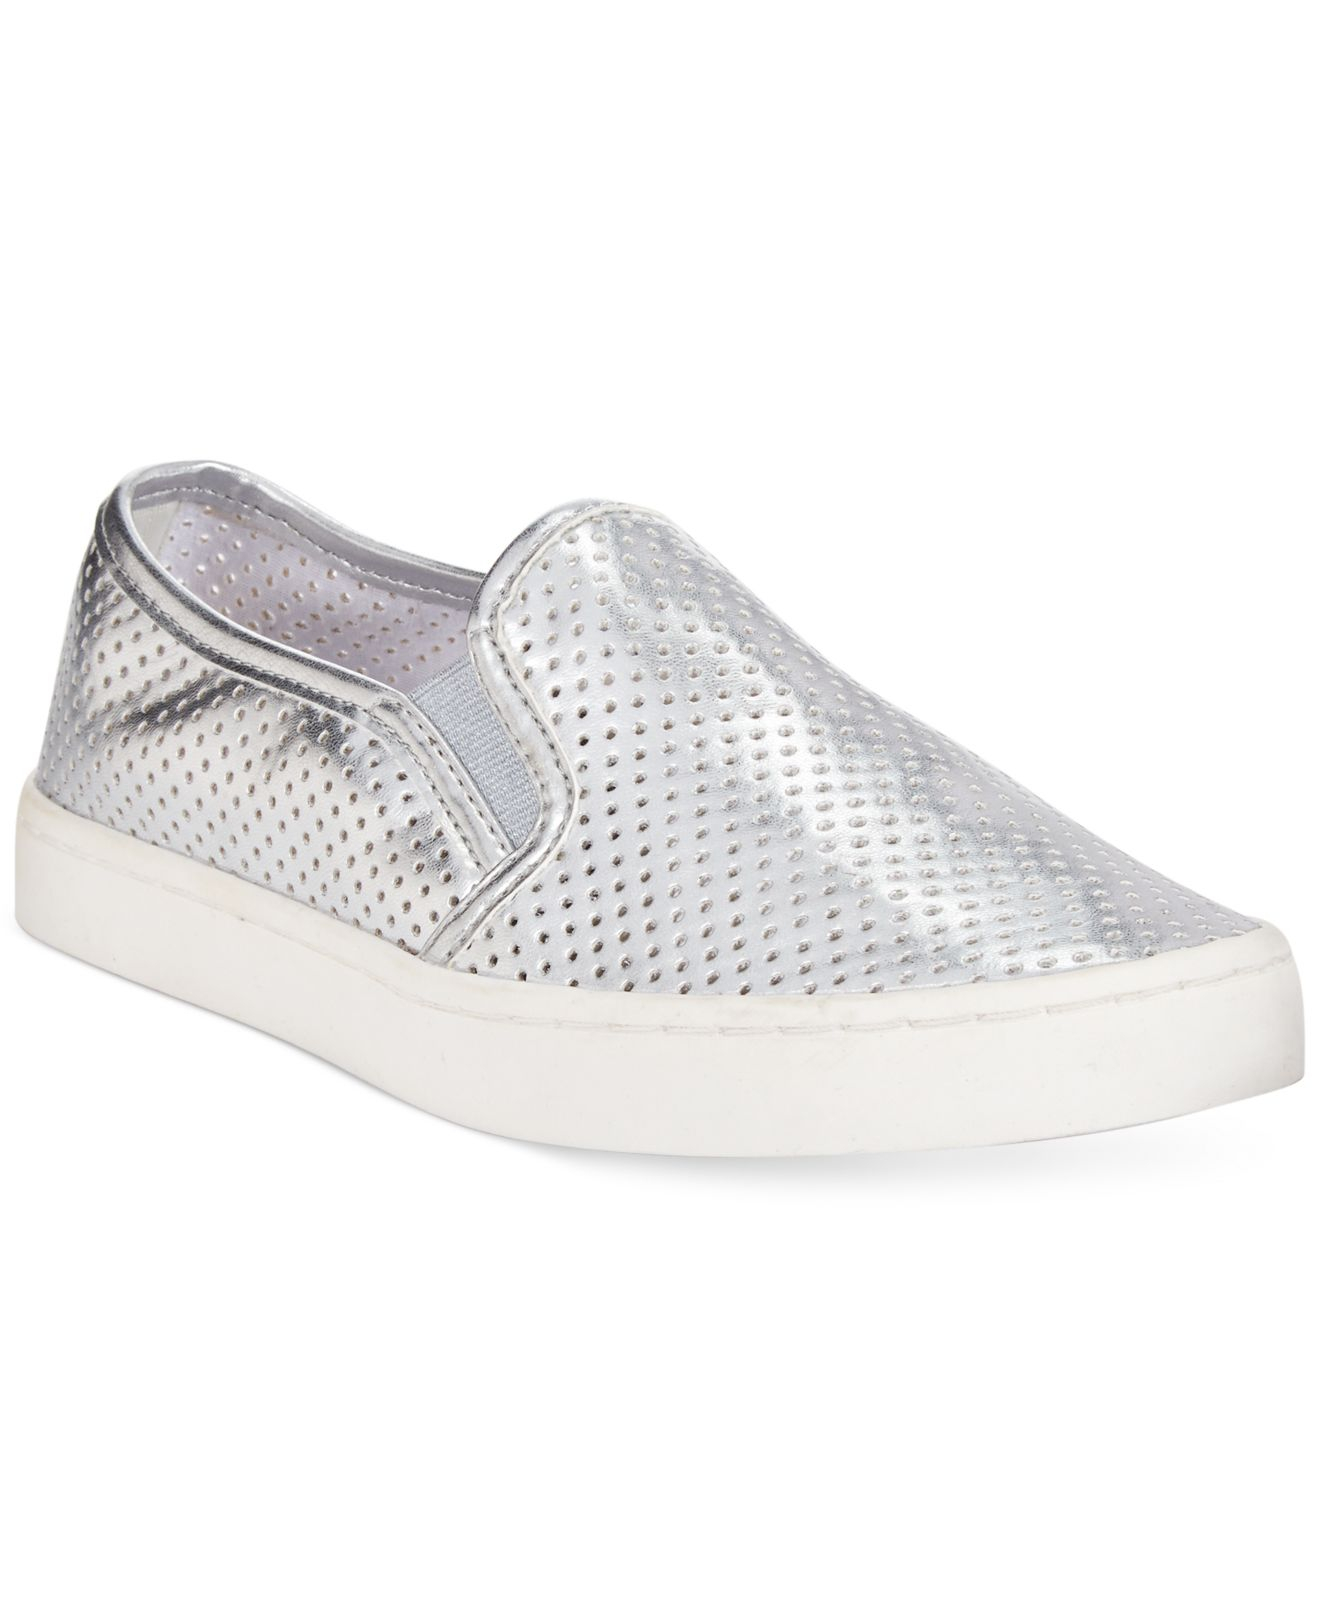 391ec0596888 Report Arvon Perforated Slip On Sneakers in Metallic - Lyst